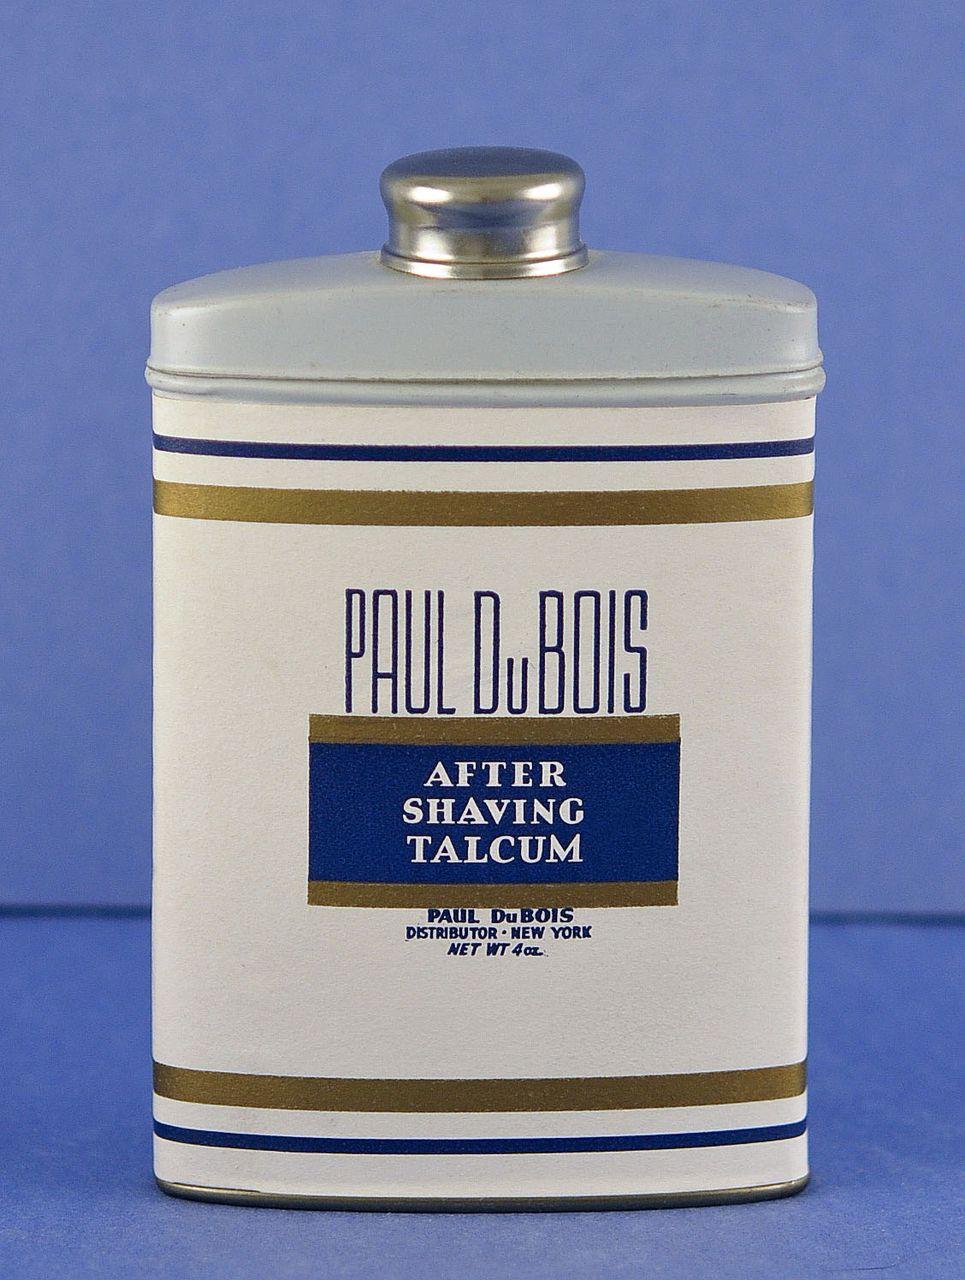 Circa 1920's, American, After Shaving Talcum Powder by Paul Du Bois in Original Tin